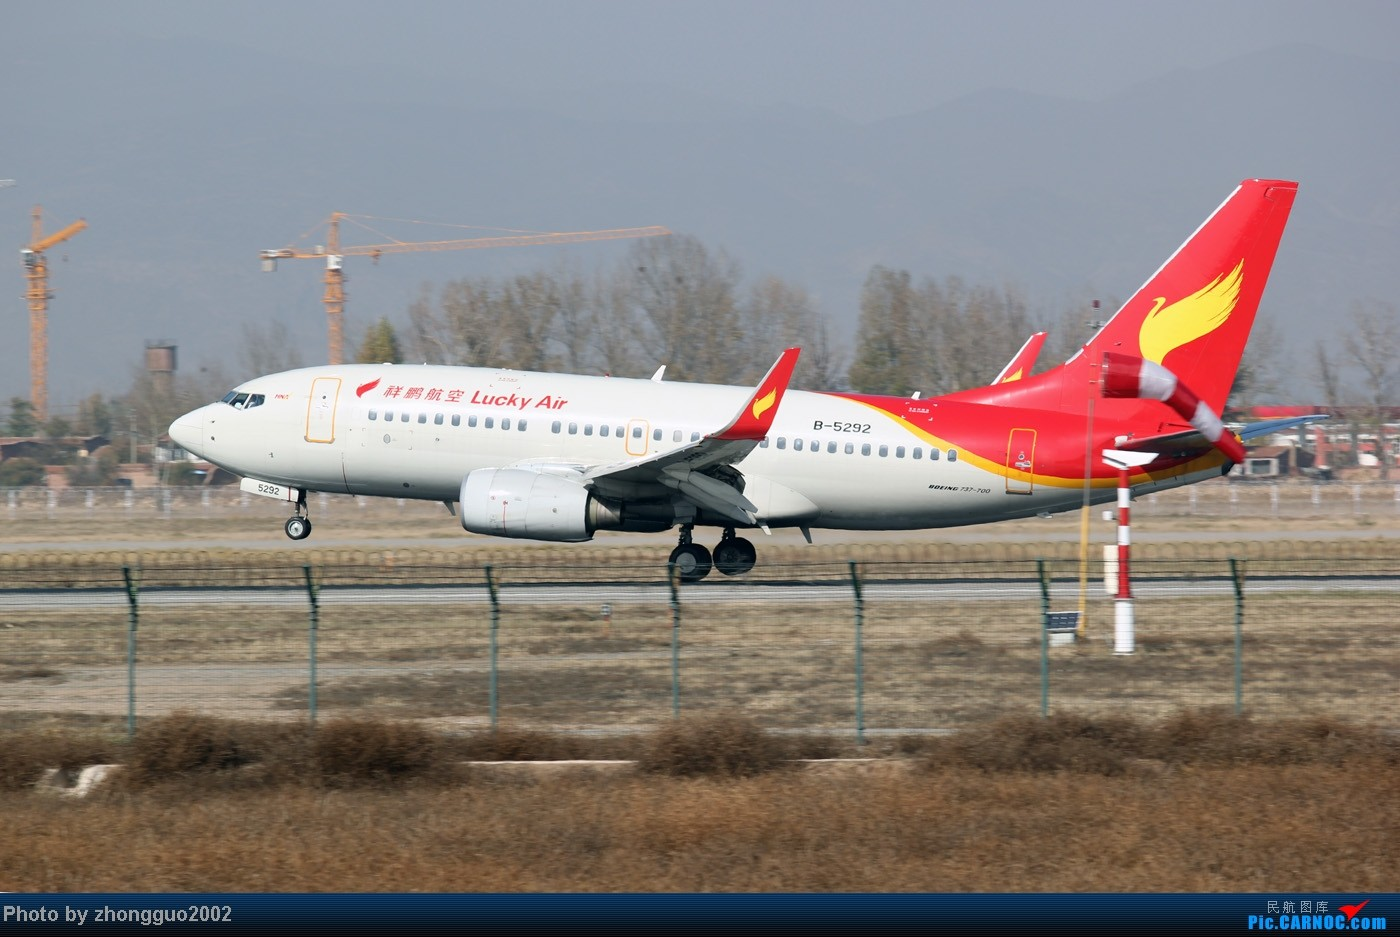 Re:[原创]随着2012年的最后一场雪的到了,我的2012年拍机工作也圆满的结束了,把这段时间里灰机整理一下,把没发的,我个人认为好的发上来! BOEING 737-700 B-5292 中国呼和浩特白塔国际机场